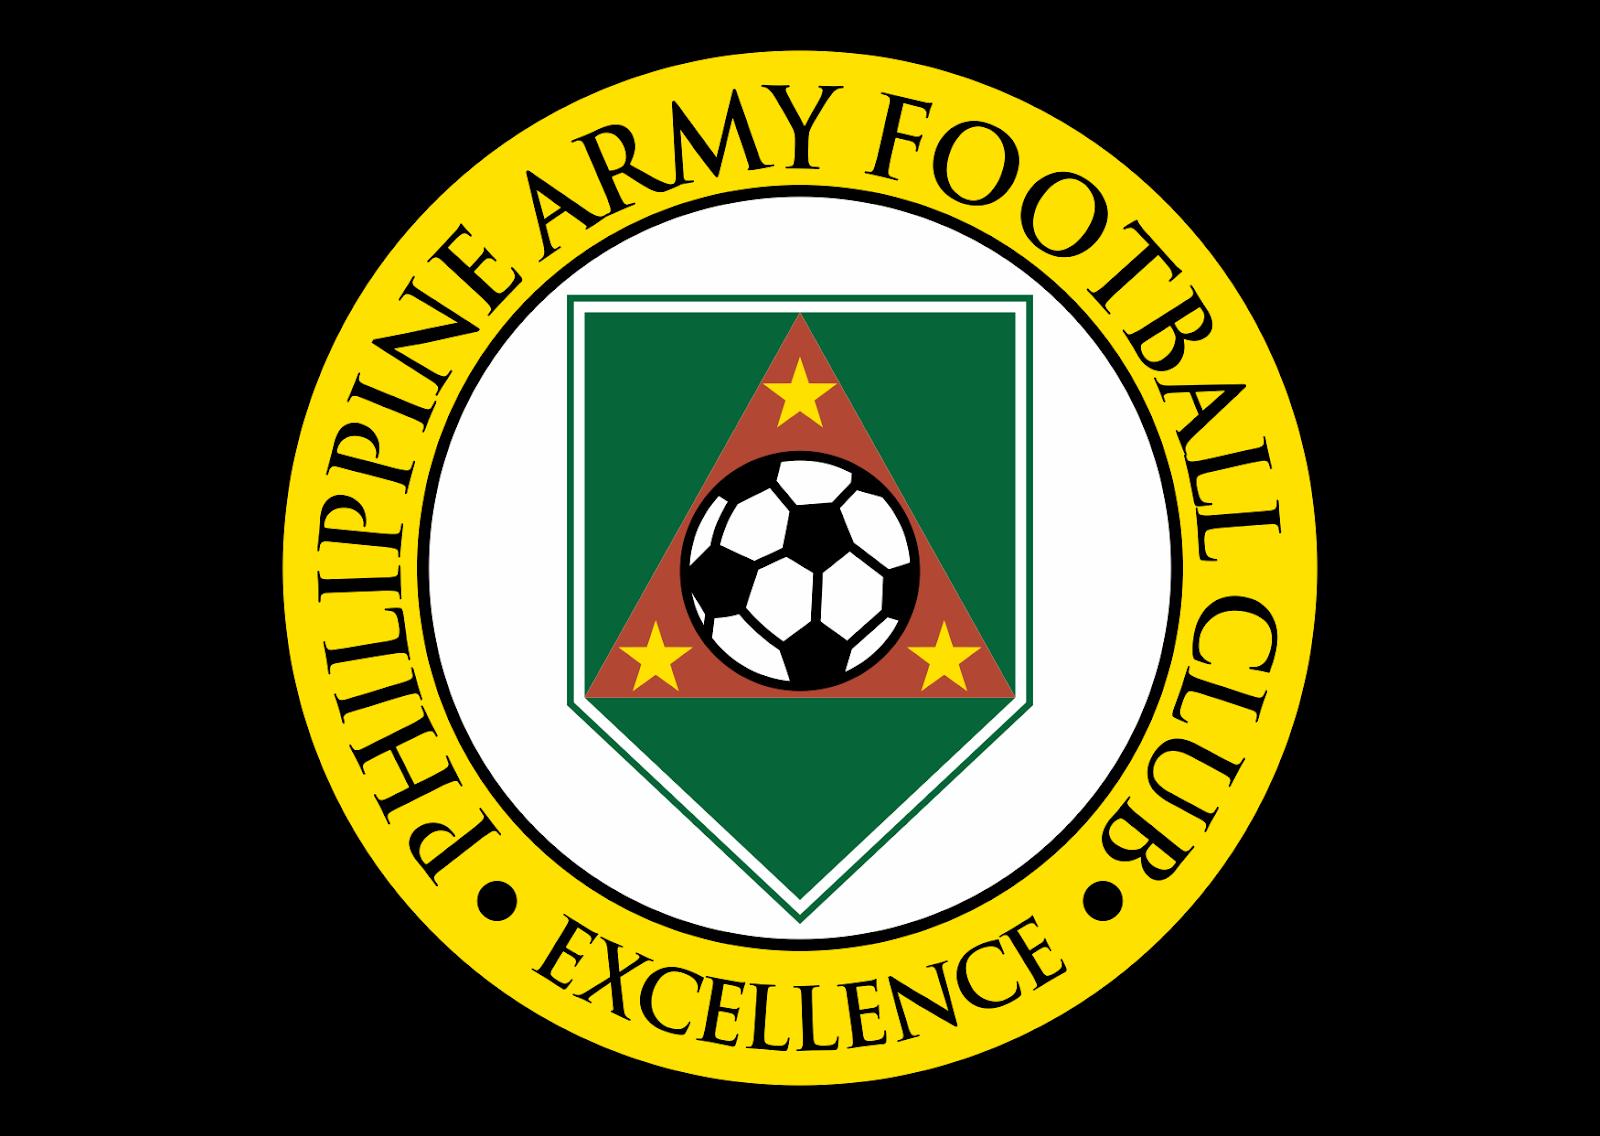 philippine army fc logo vector format cdr ai eps svg pdf png rh master logo blogspot com salvation army logo vector monster army logo vector